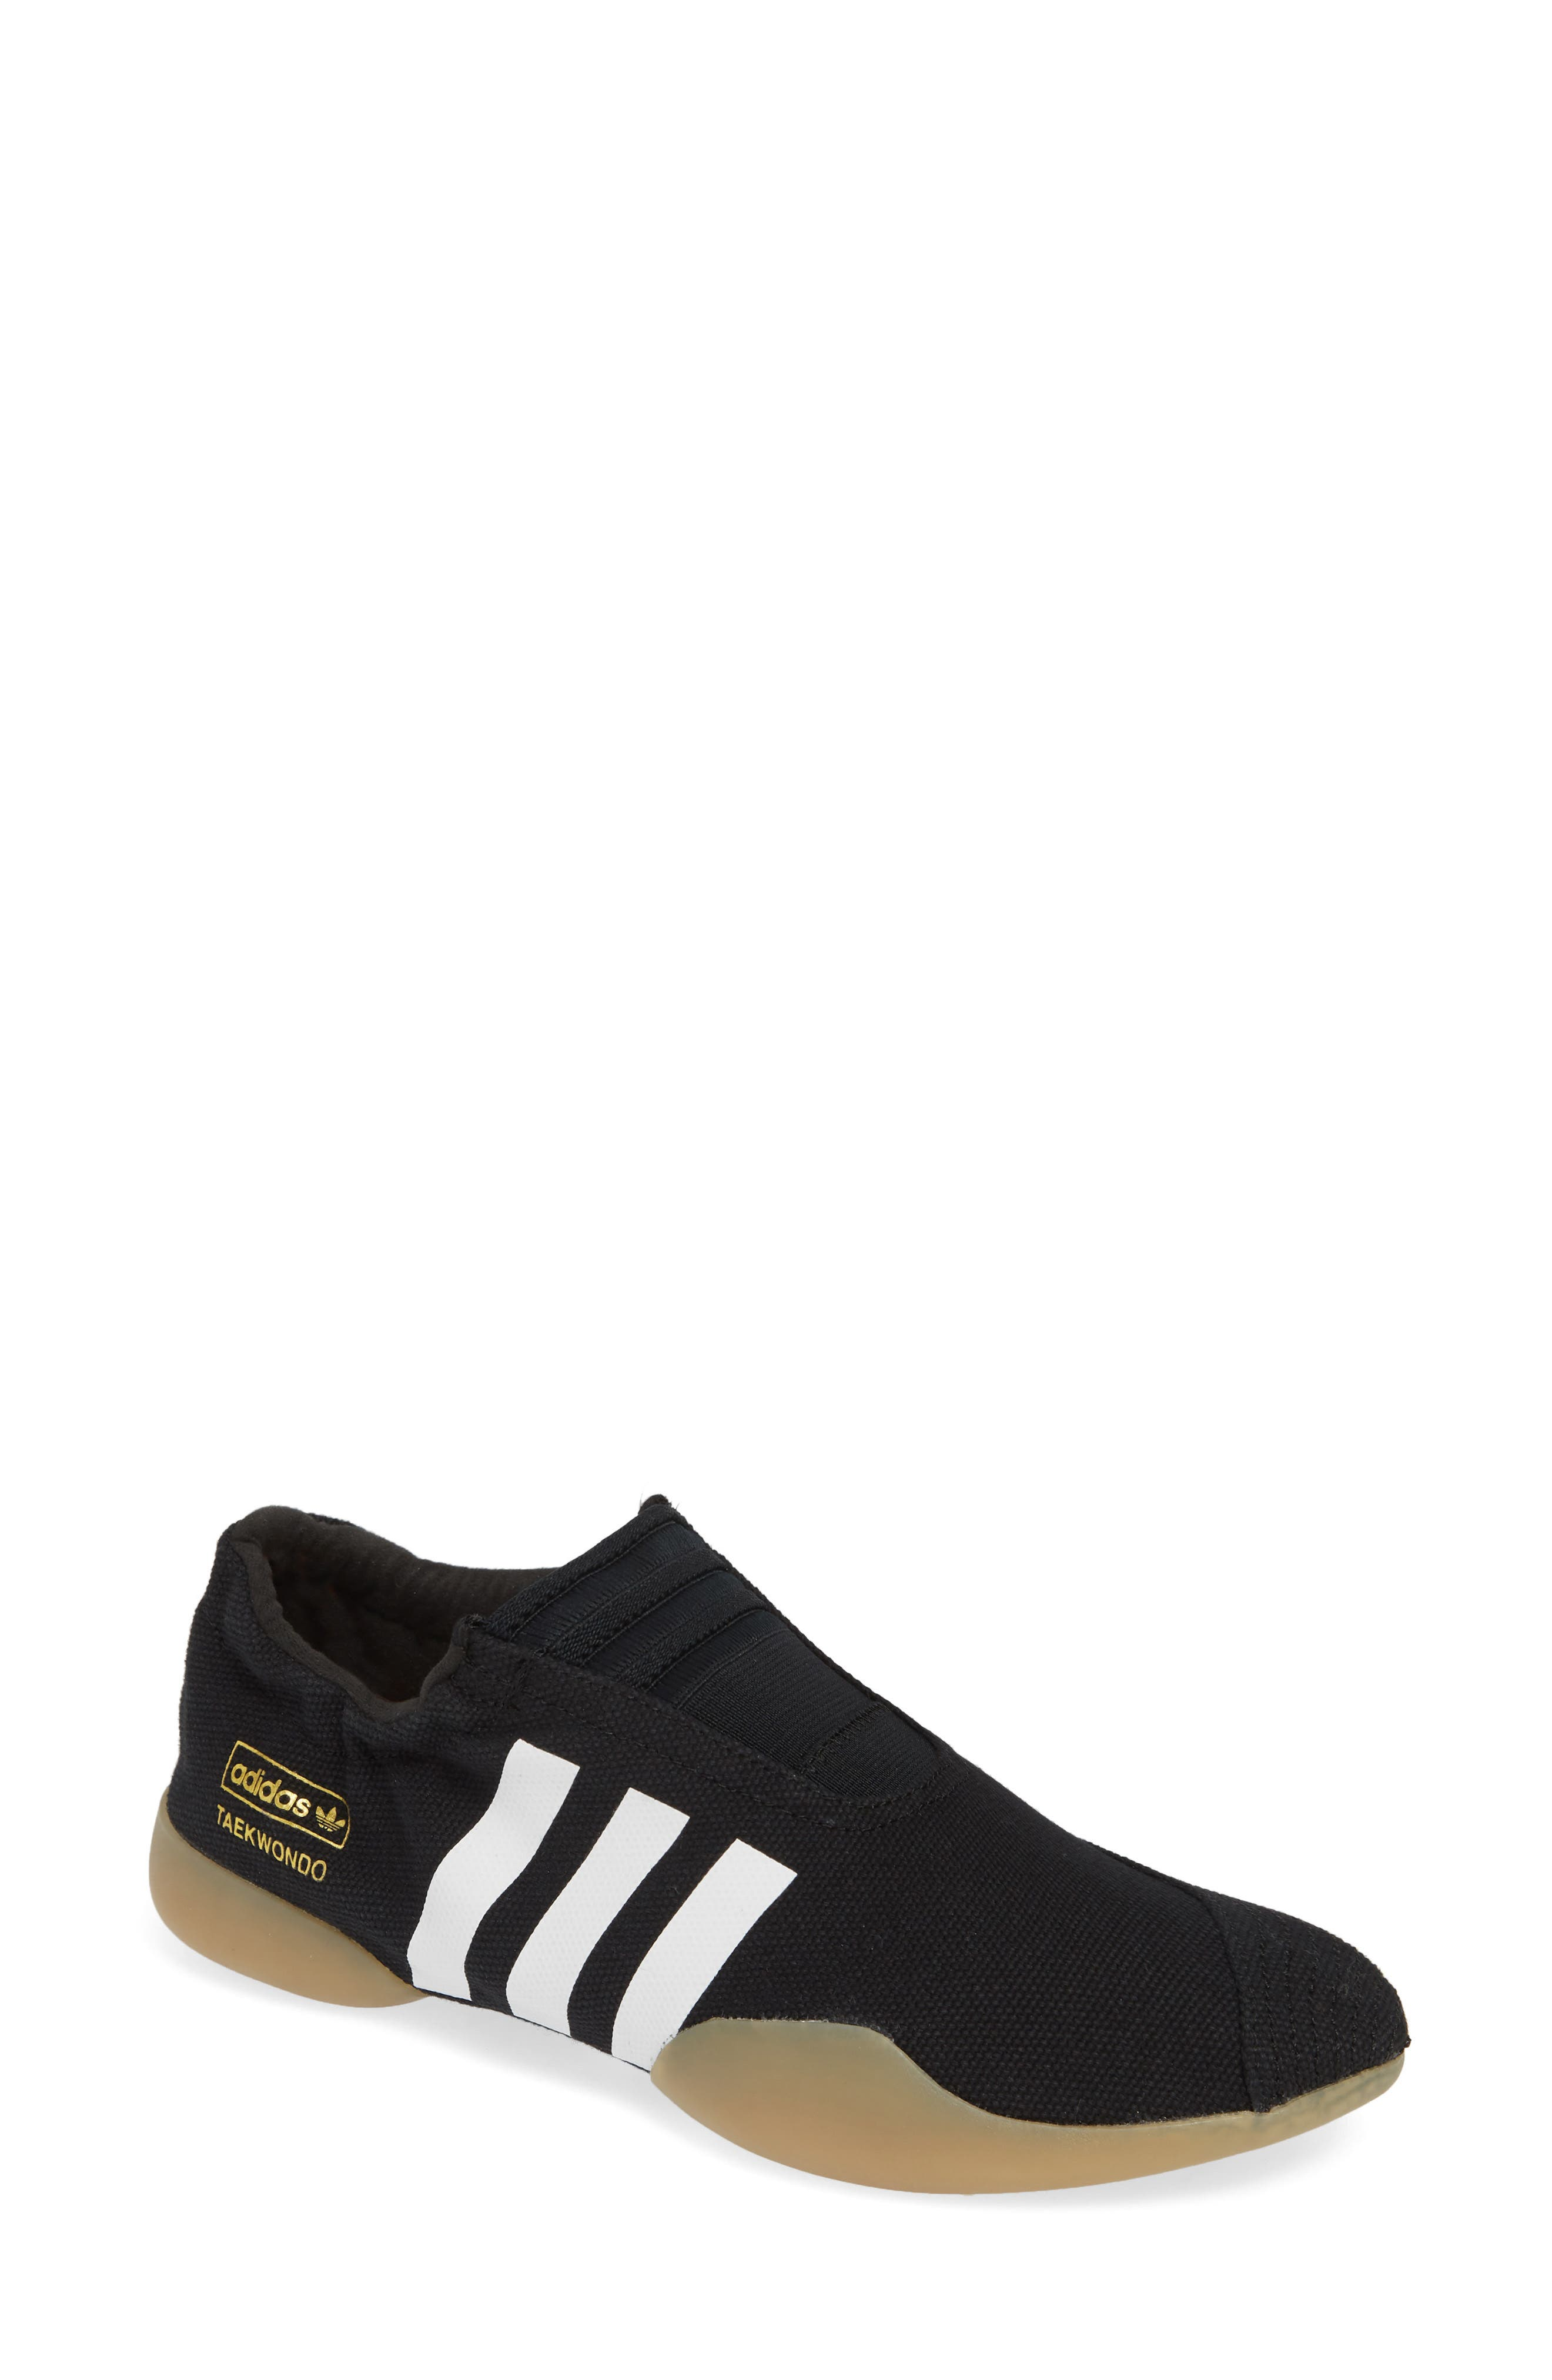 Taekwondo Slip-On Sneaker, Main, color, CORE BLACK/ WHITE/ GUM 3